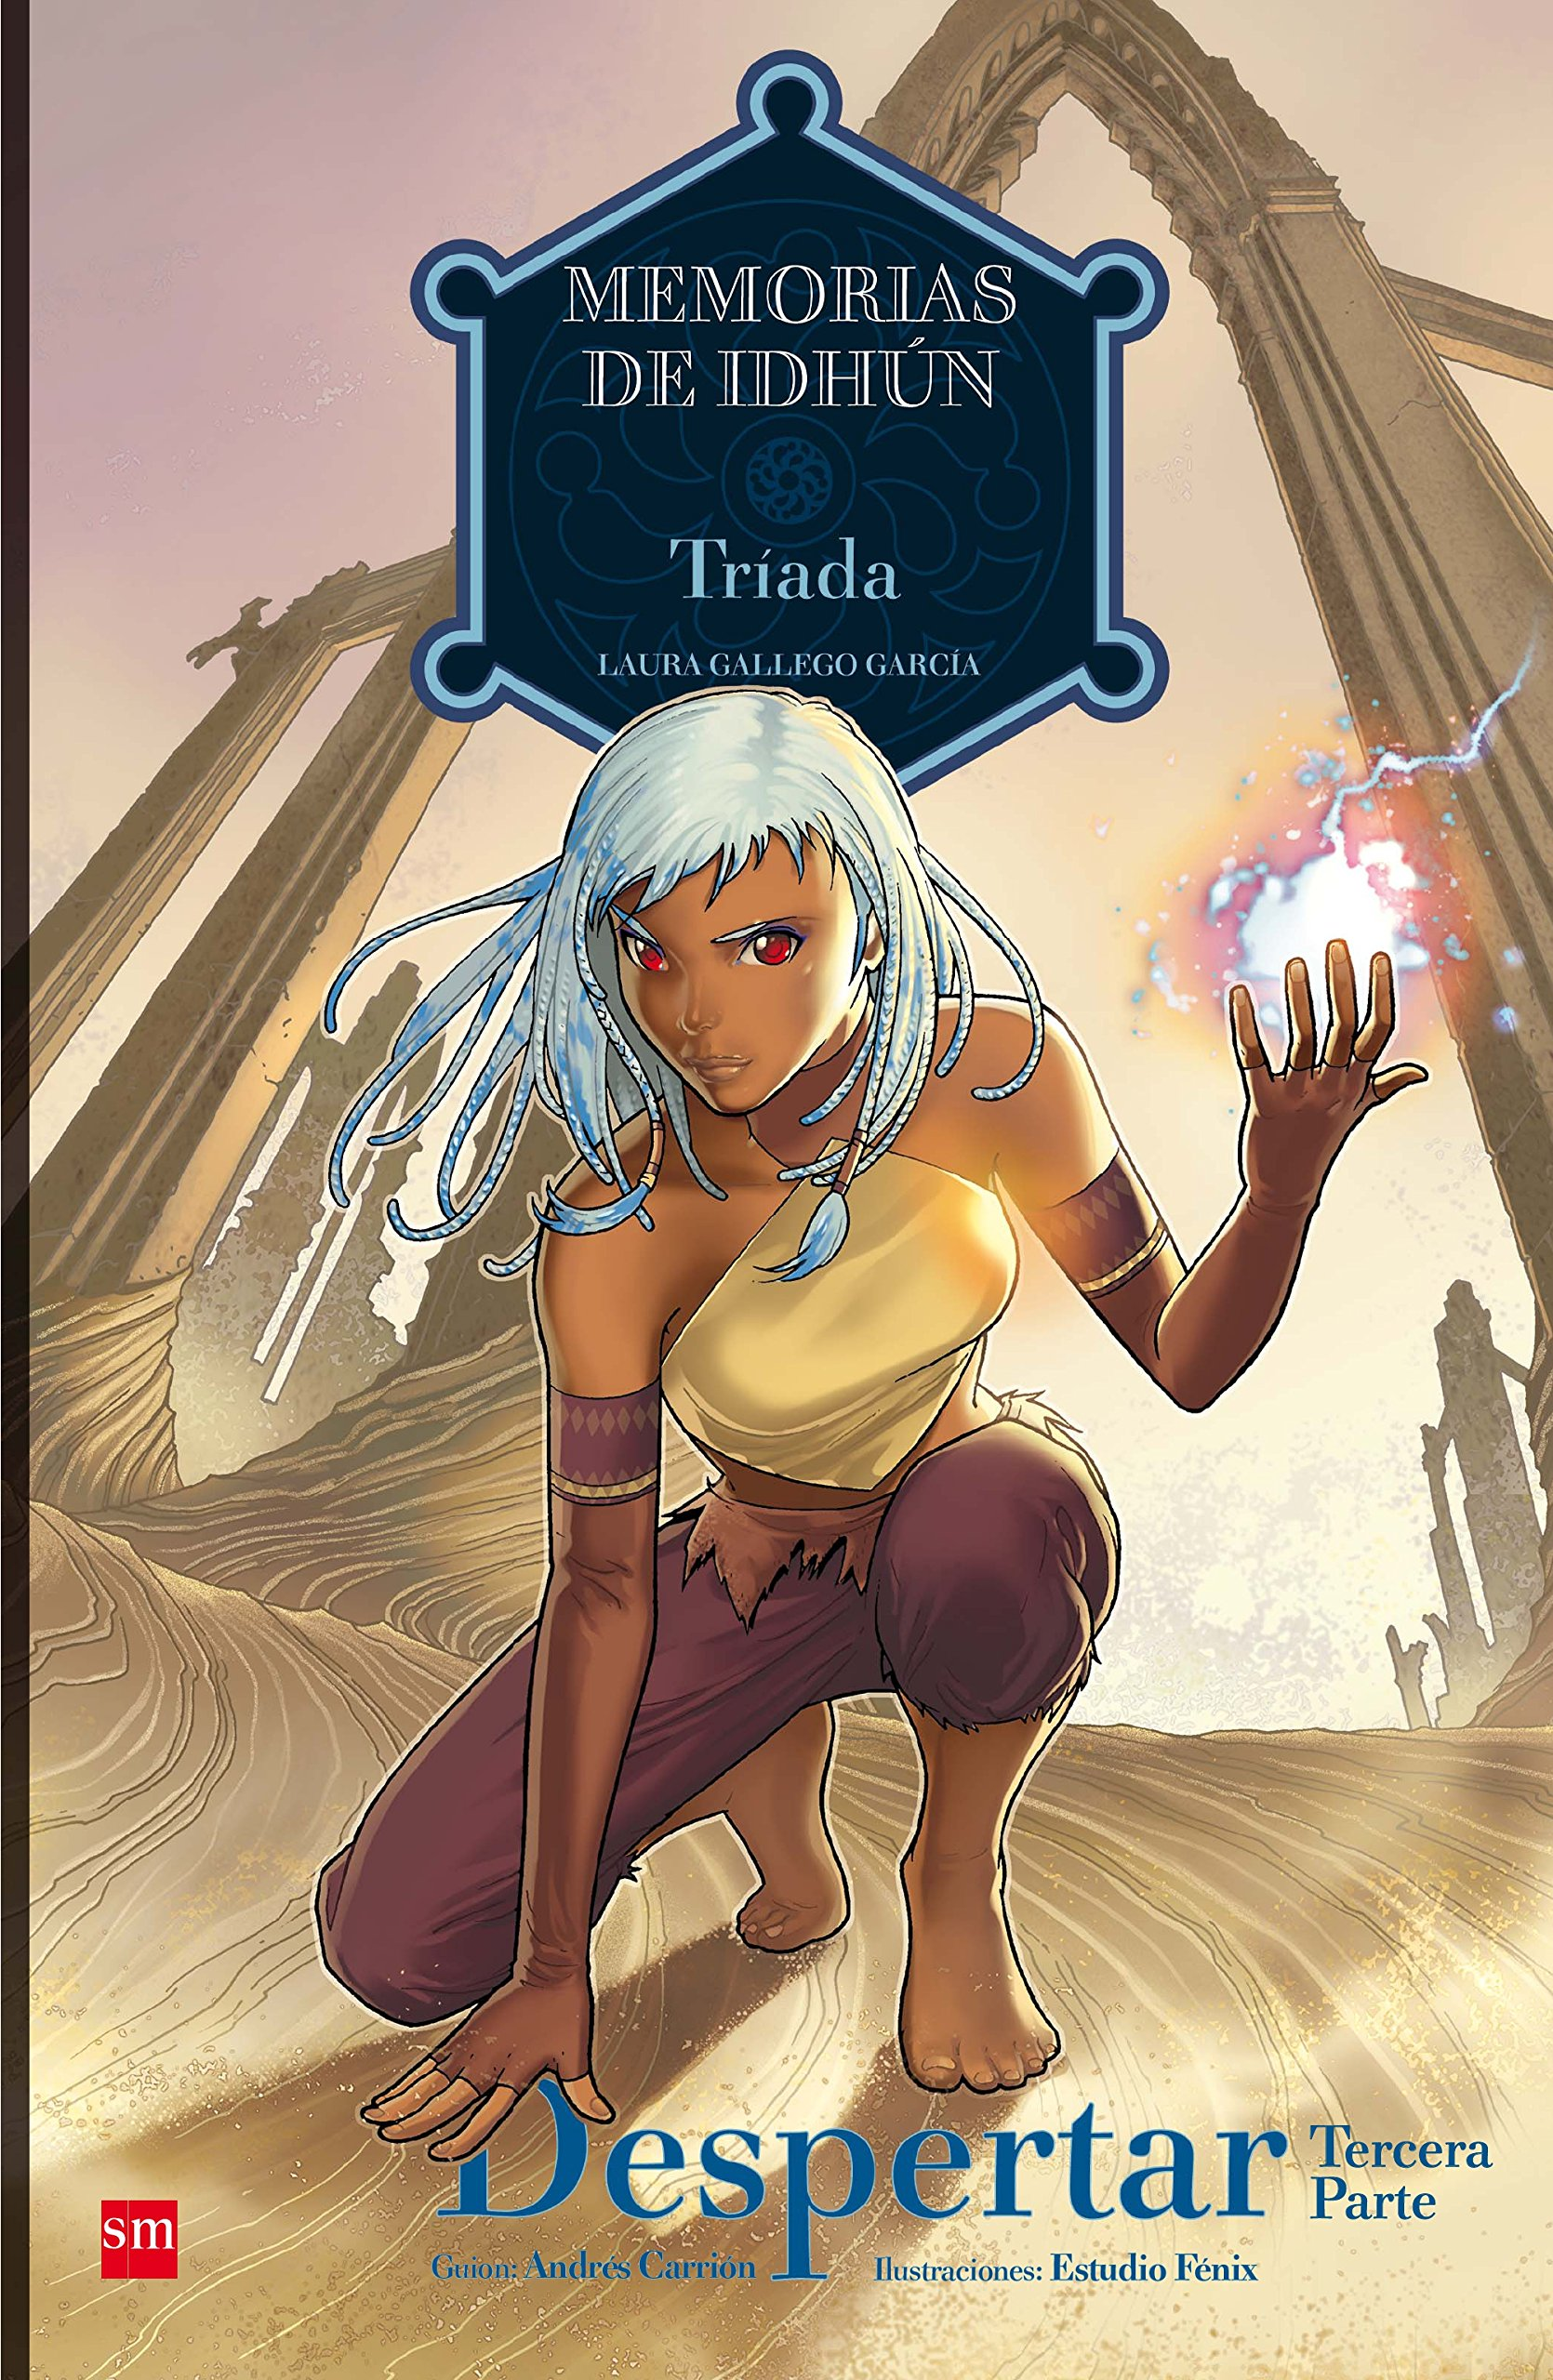 comics memorias de idhun